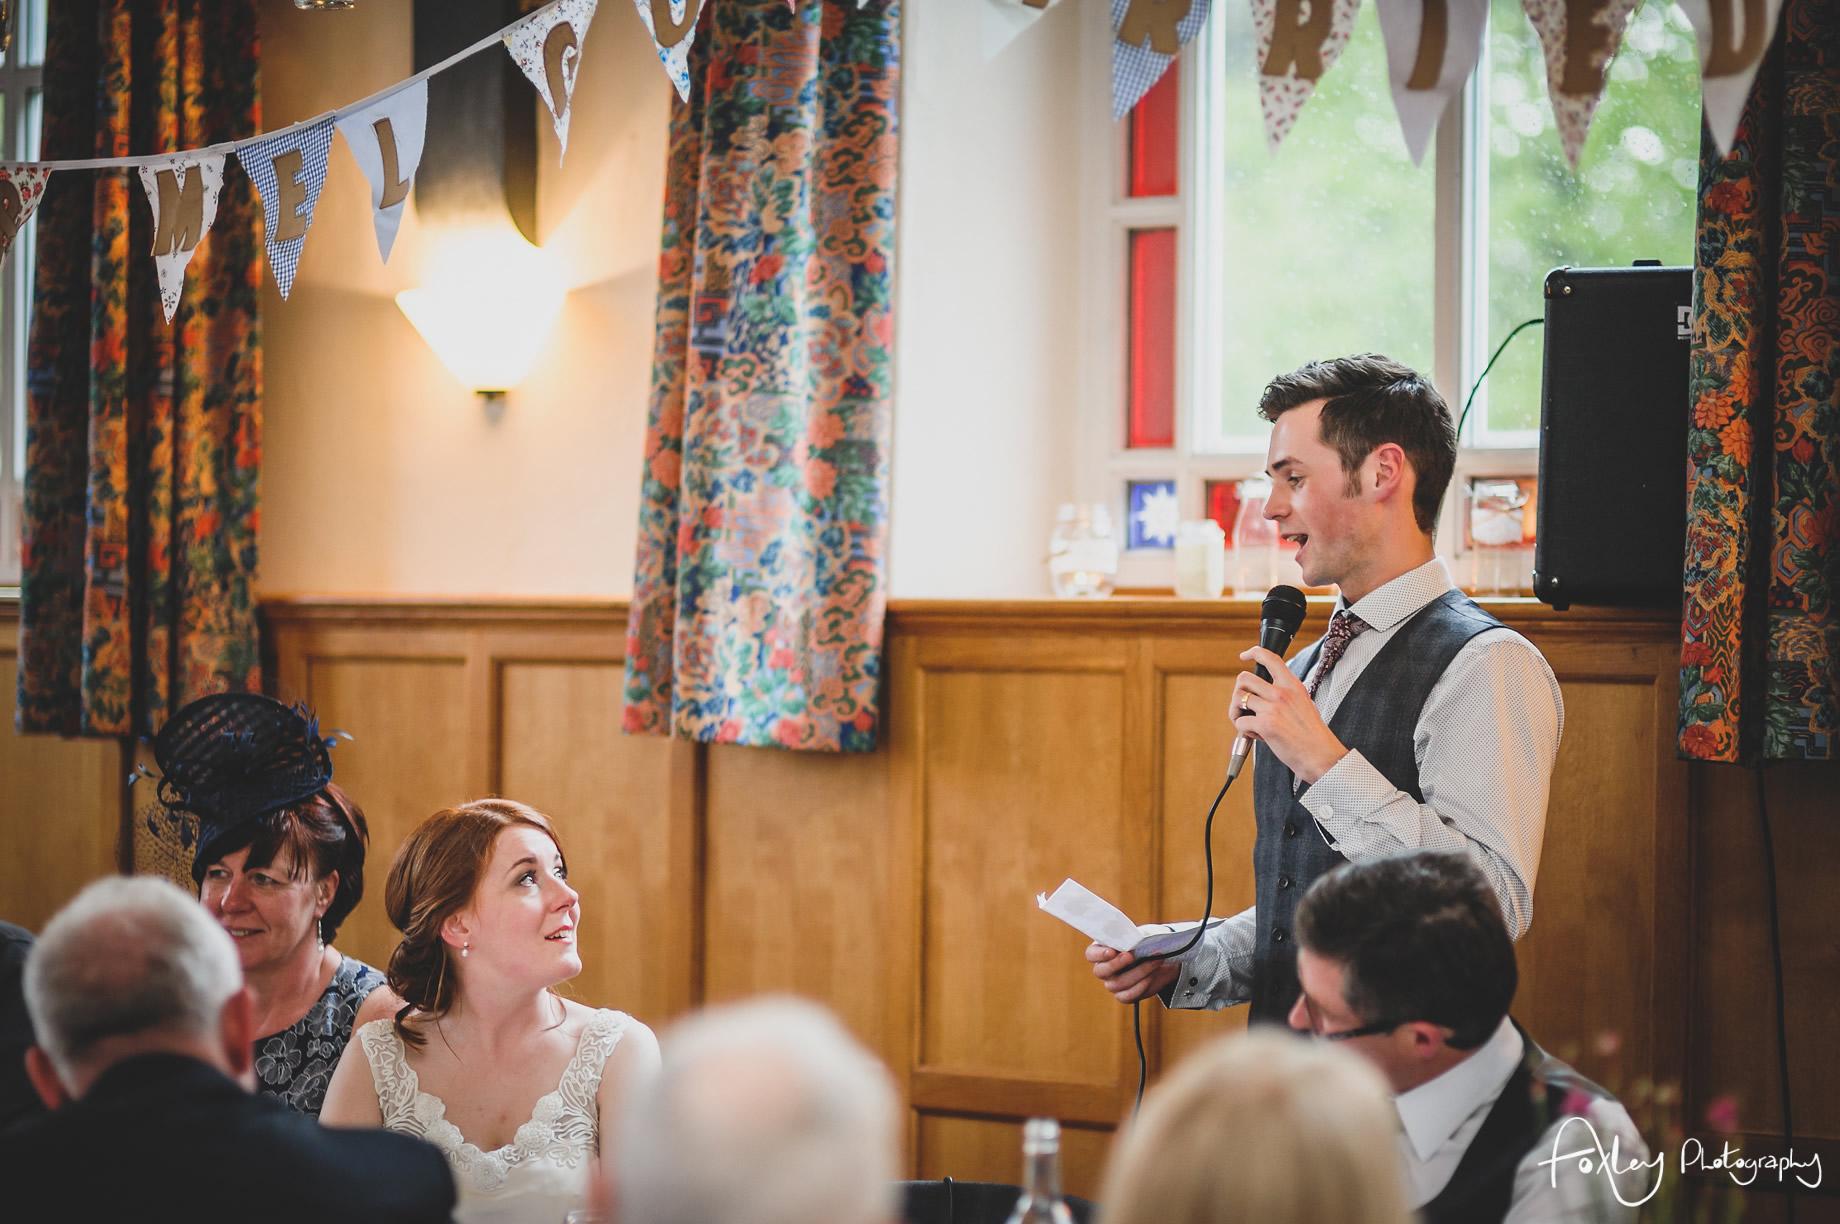 Mel-and-Lewis-Wedding-at-Barley-Village-Hall-153